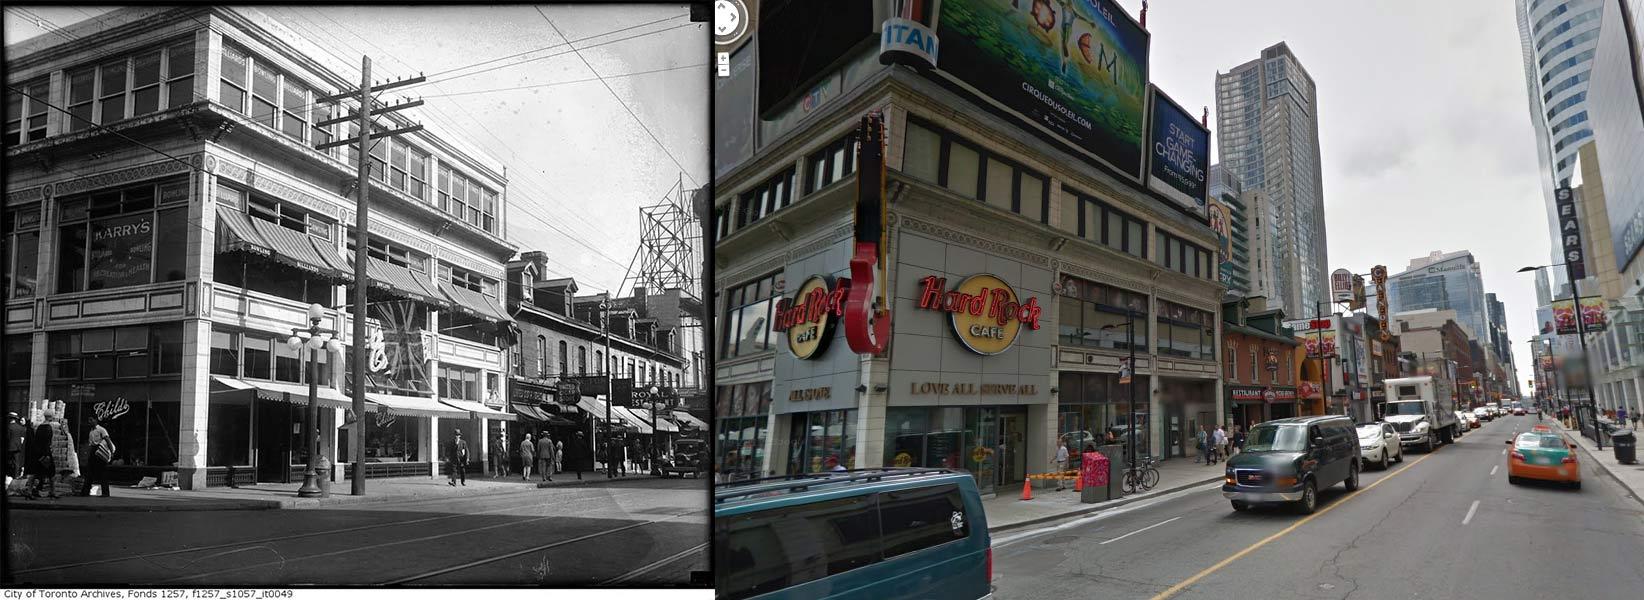 Yonge Street @ Dundas Square Toronto